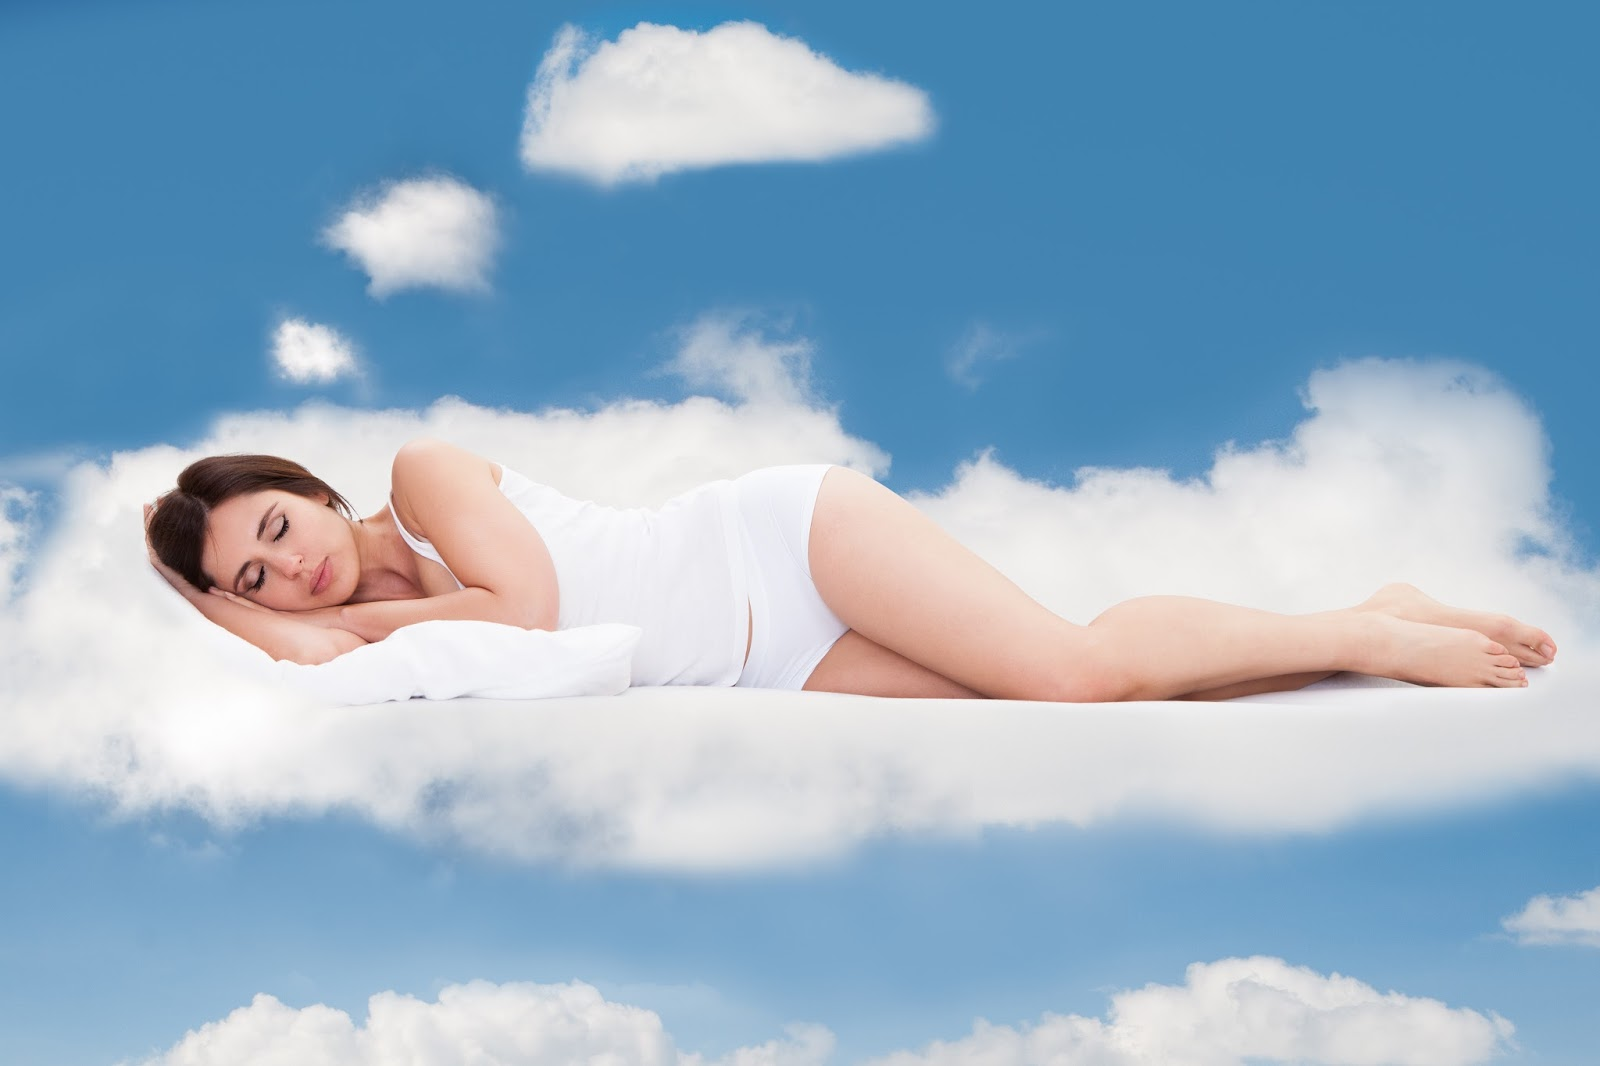 Morning people get higher-quality slumber